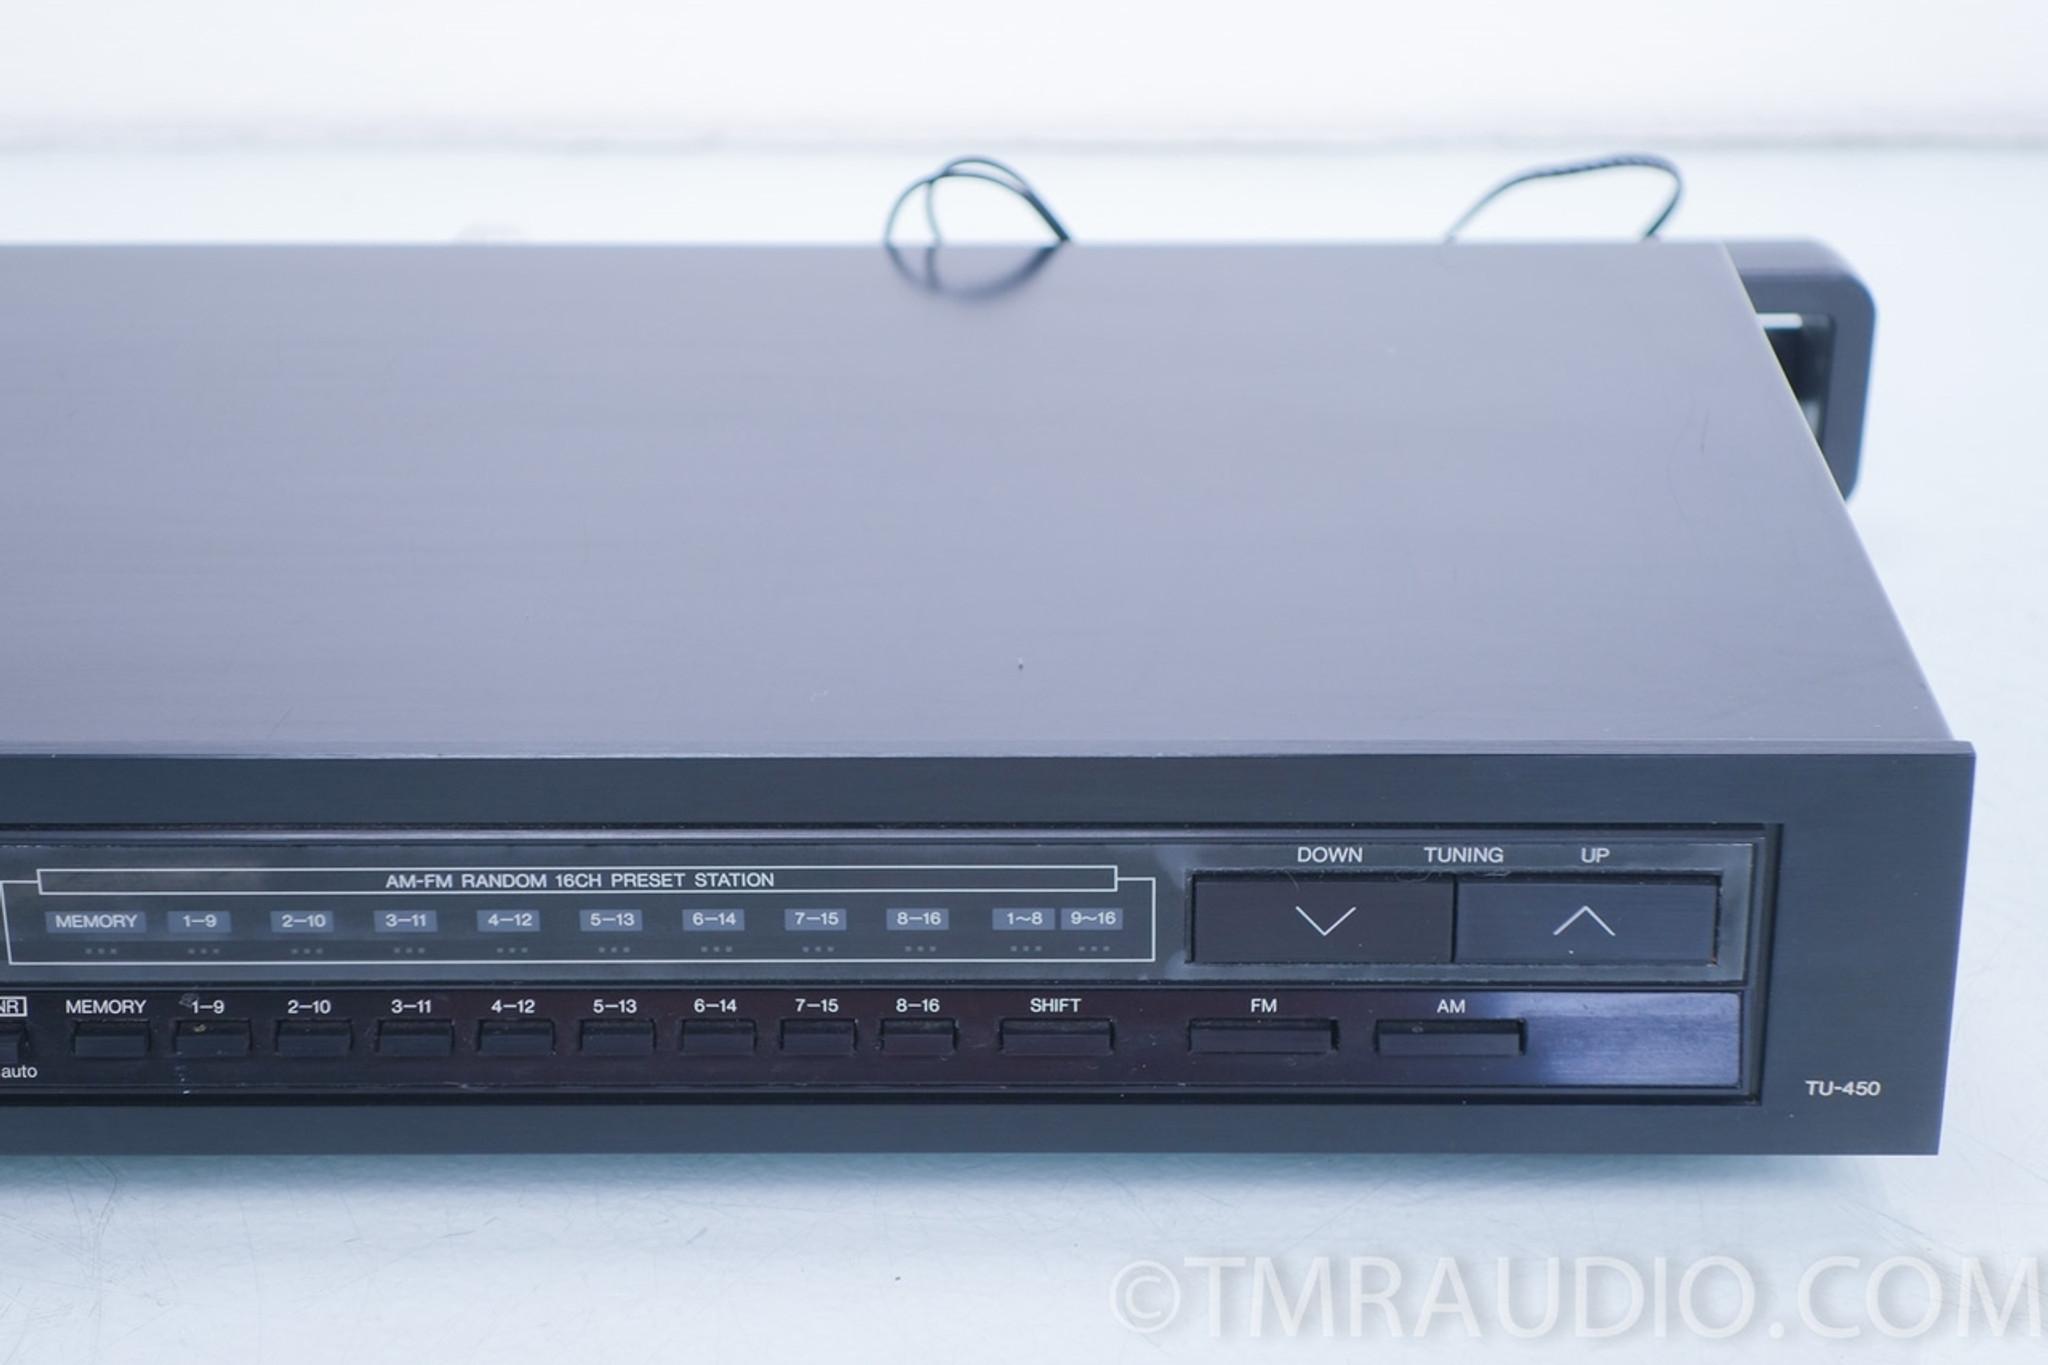 Denon TU-450 Stereo AM / FM Tuner